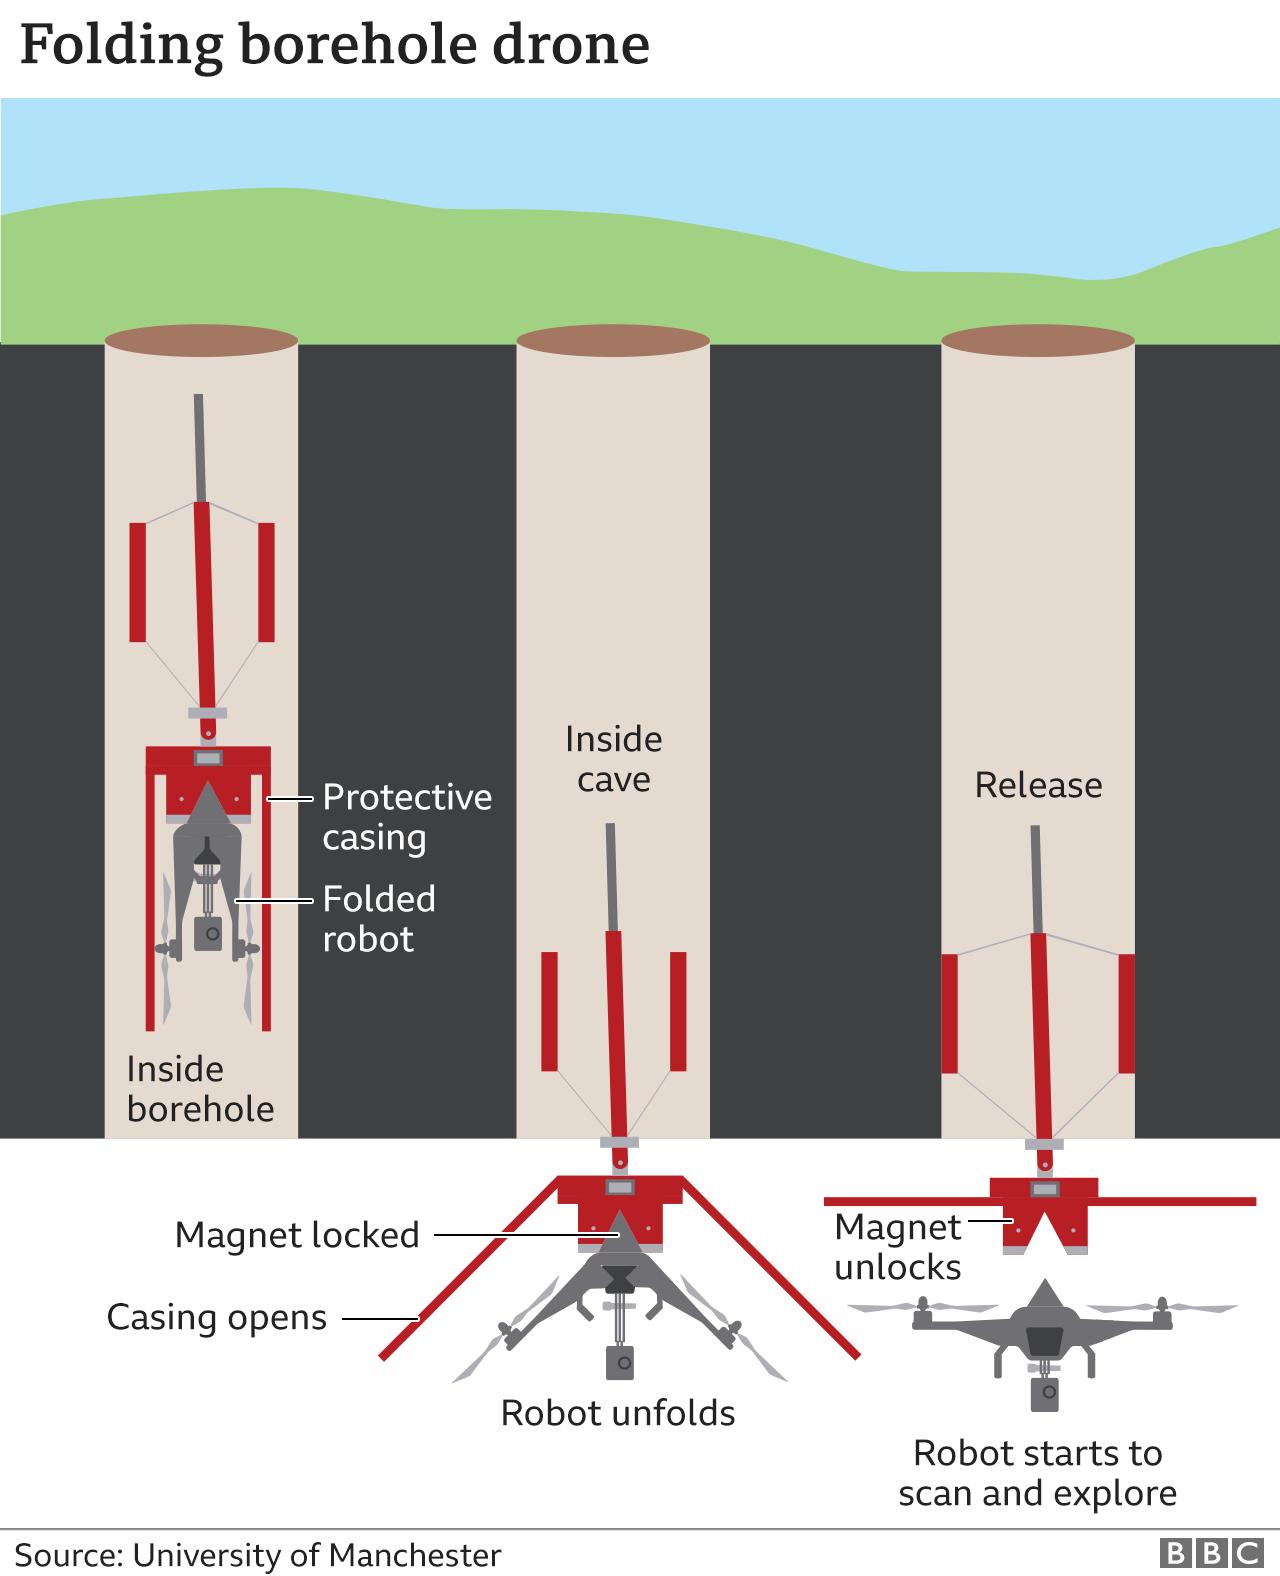 Folding borehole drone